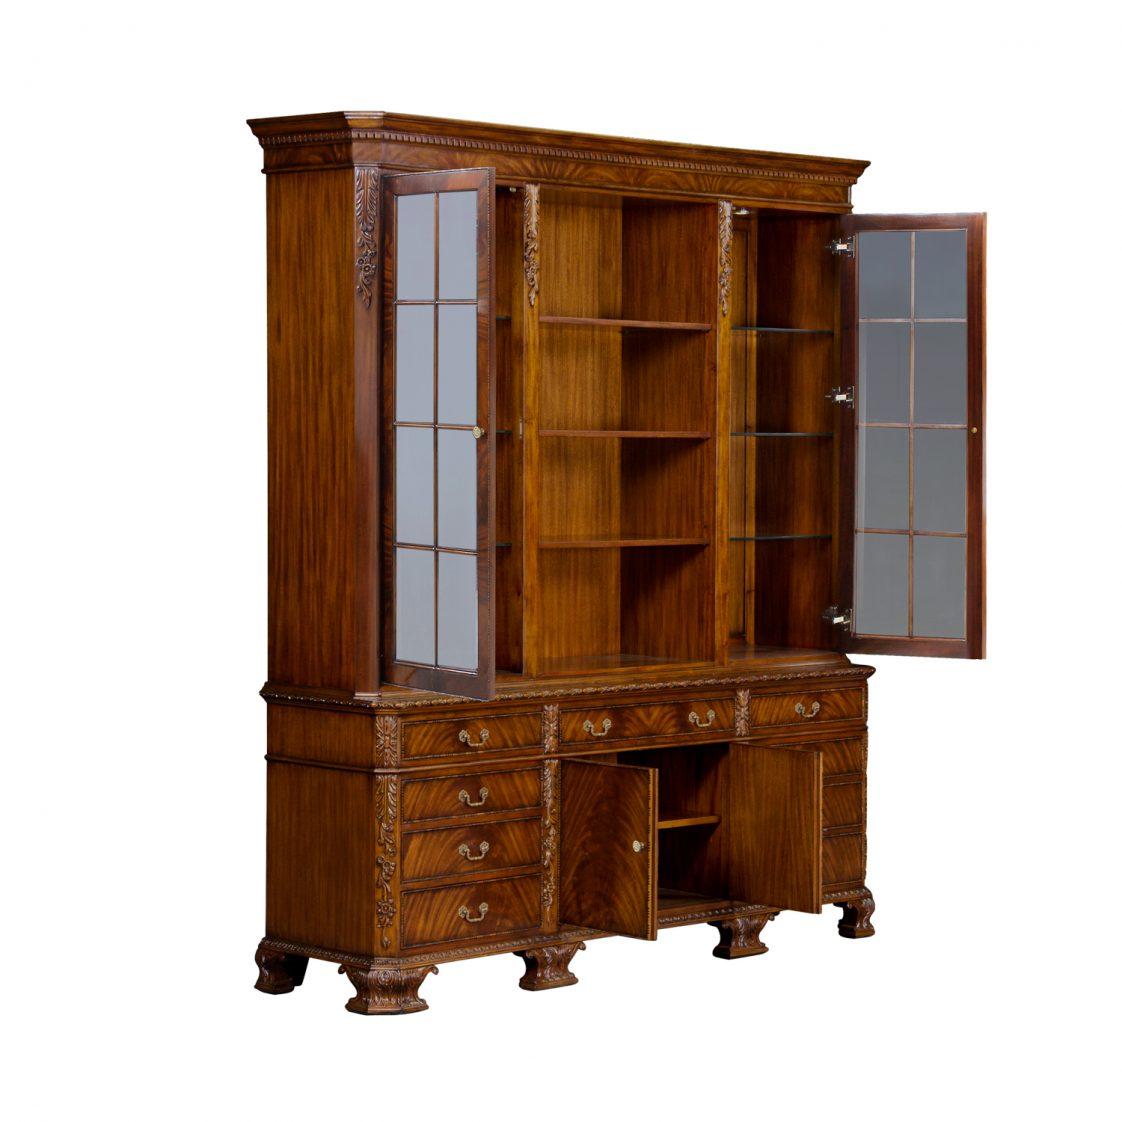 George Ii Bookcase With Light Jansen Furniture